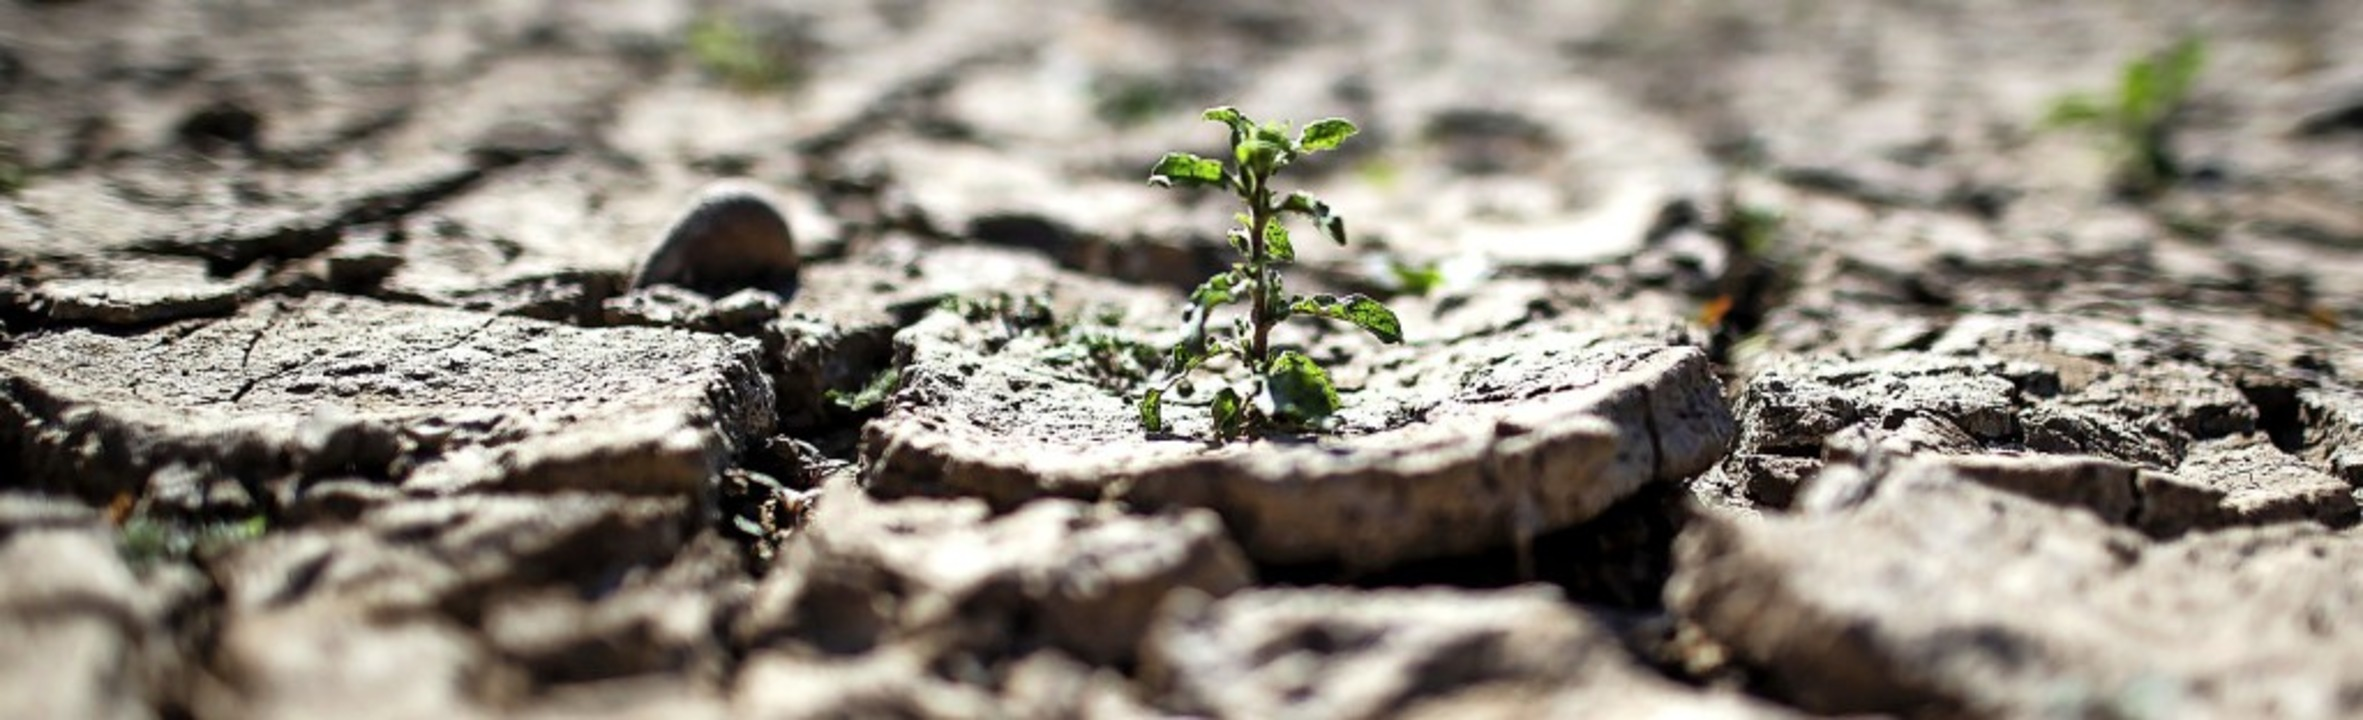 Auch im Schwarzwald nehmen trockene Pe... anderem extrem ausgetrocknete Böden.   | Foto: Federico Gambarini (dpa)